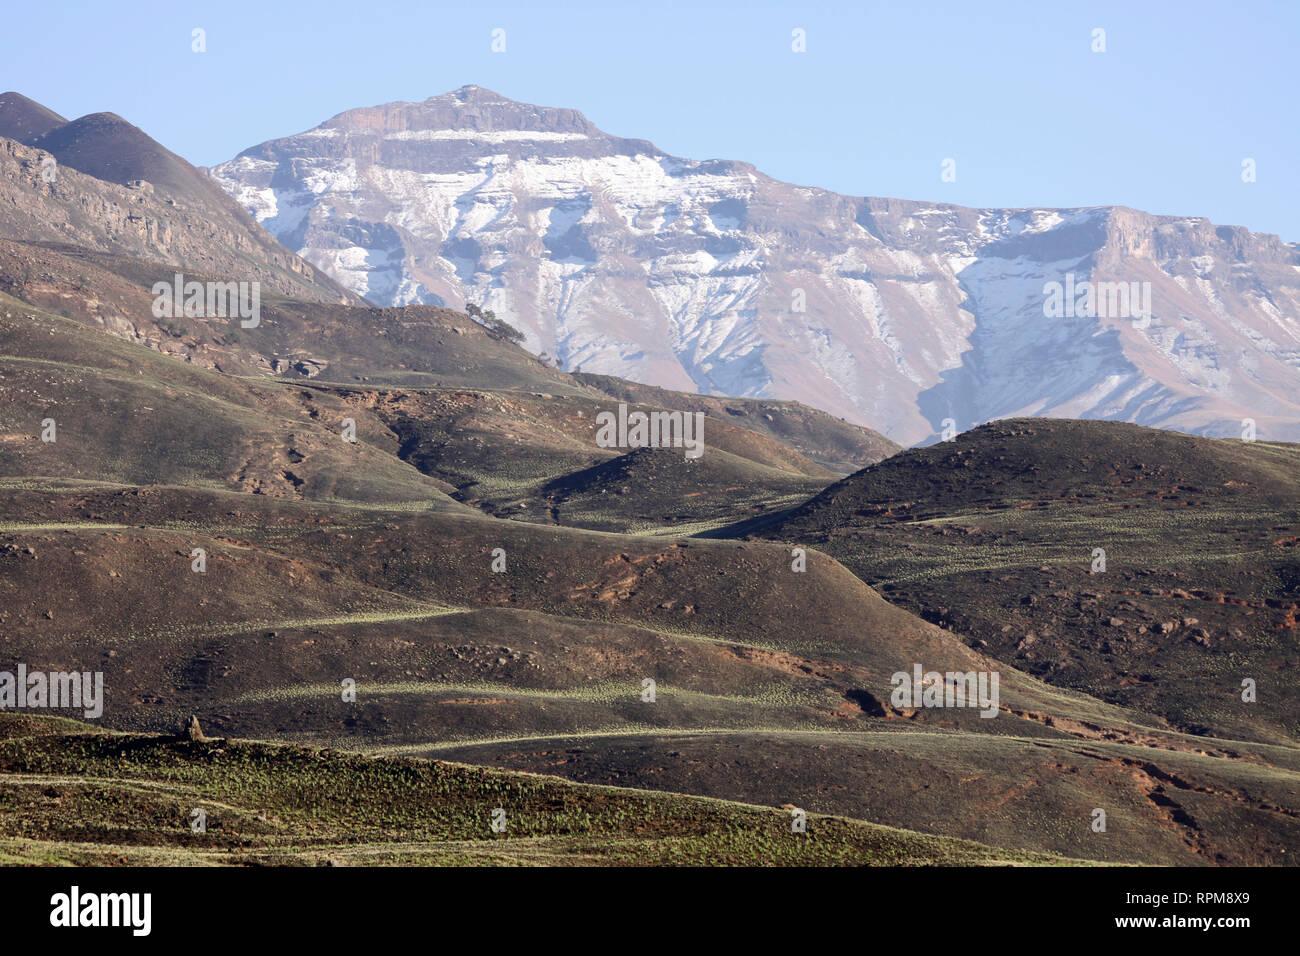 Snow in Drakensburg Mountains, Kwazulu Natal, South Africa - Stock Image